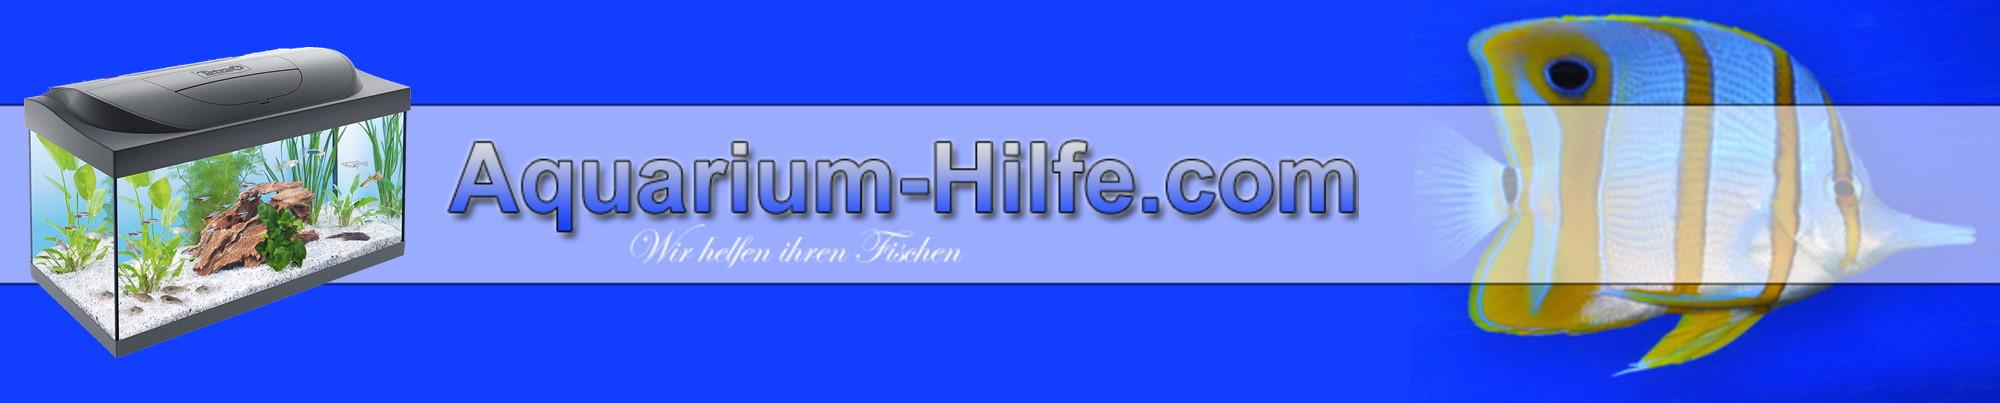 Aquarium-hilfe.com